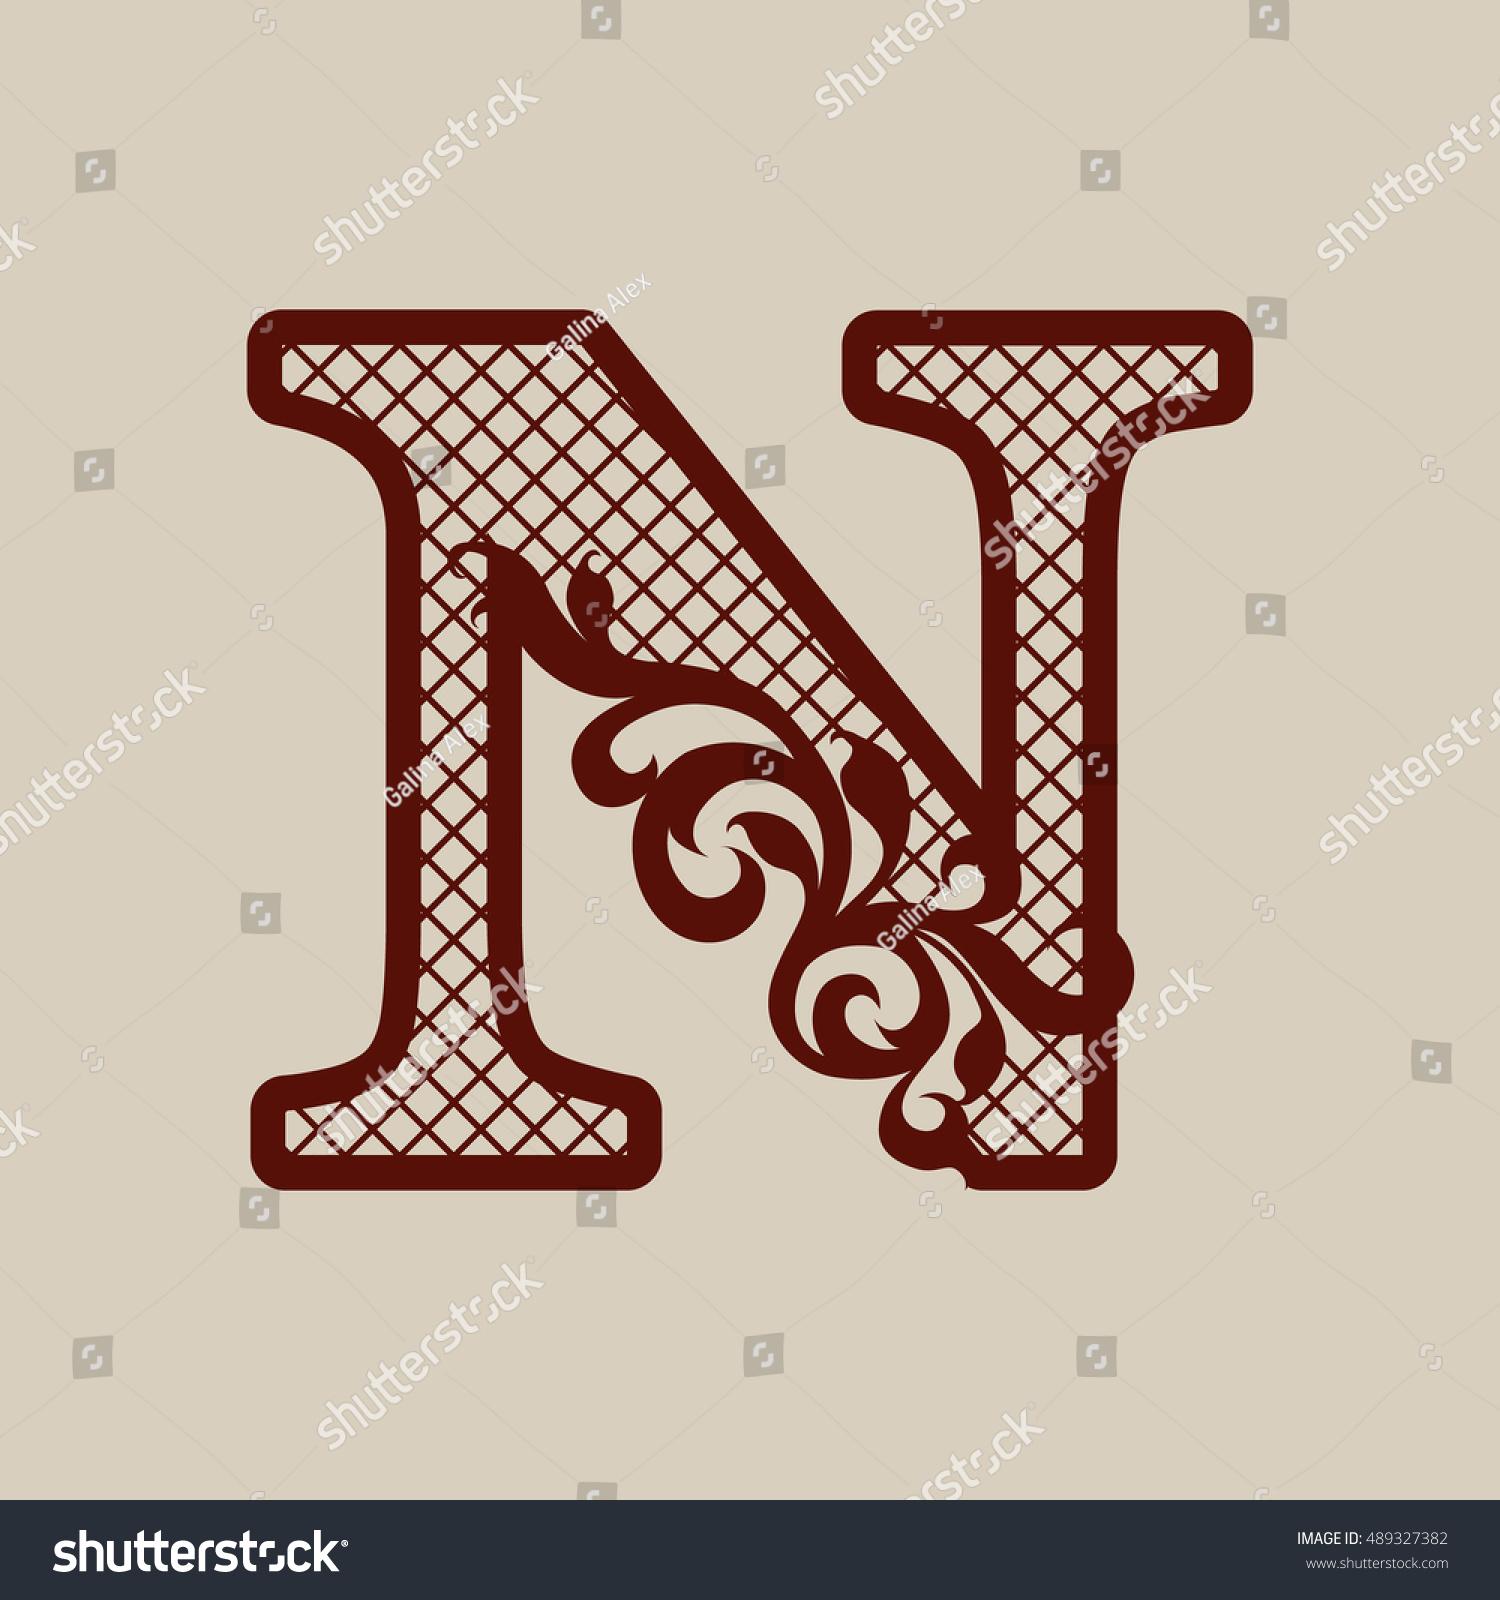 Initial Letter N Elegant Monogram Carved Stock Vector (Royalty Free ...